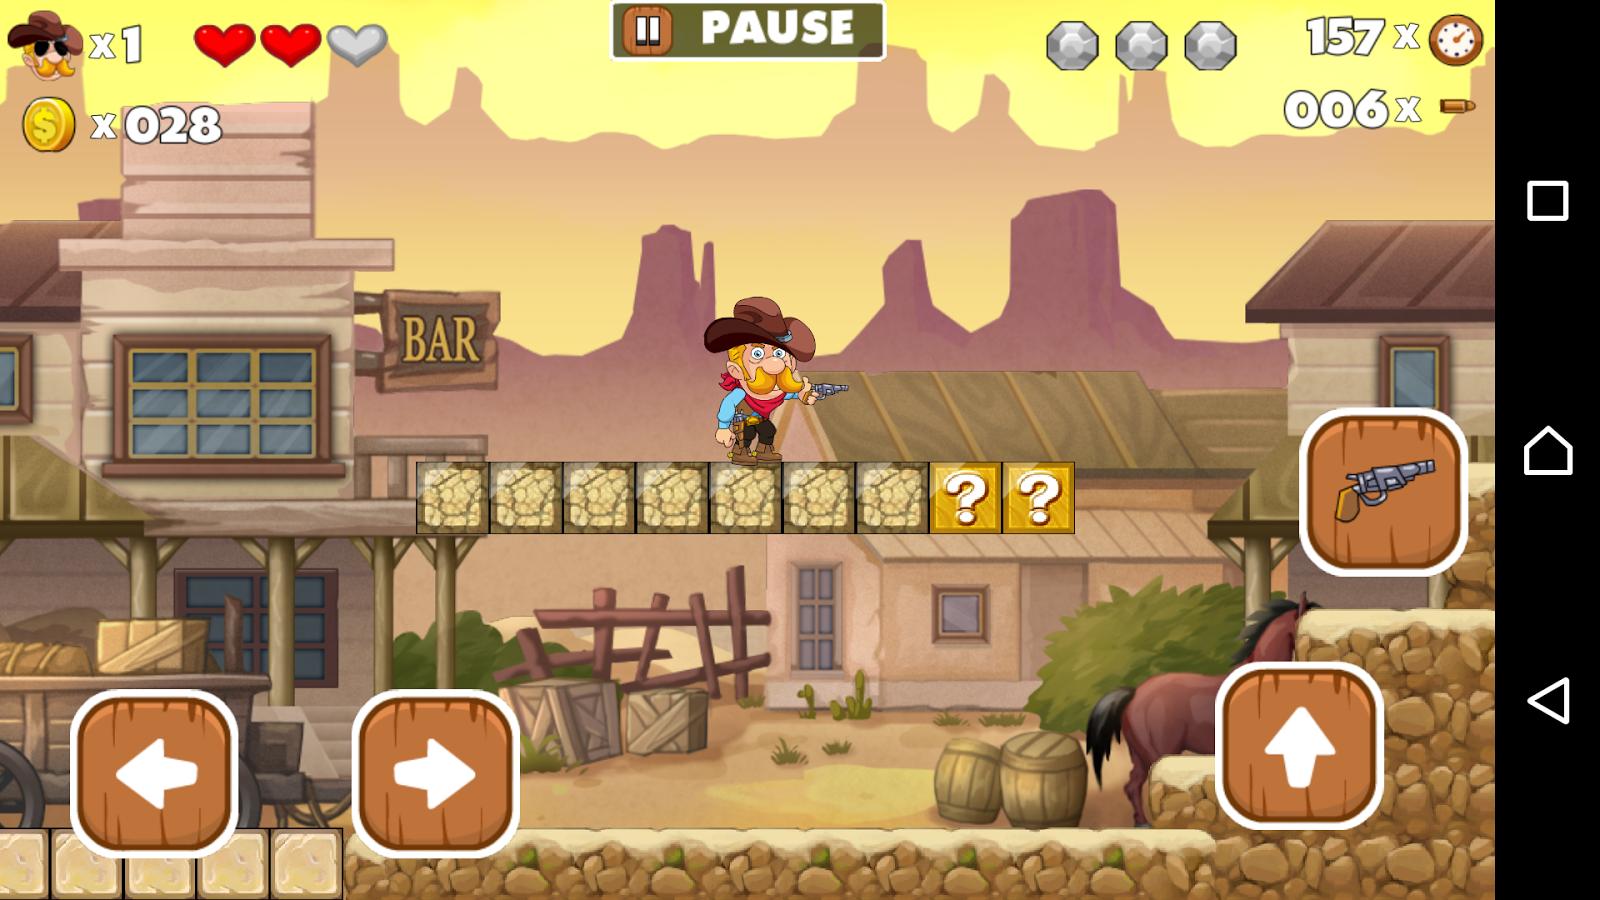 العم جدو لعبة مغامرات 7 0 1 Apk Download Android Adventure Games